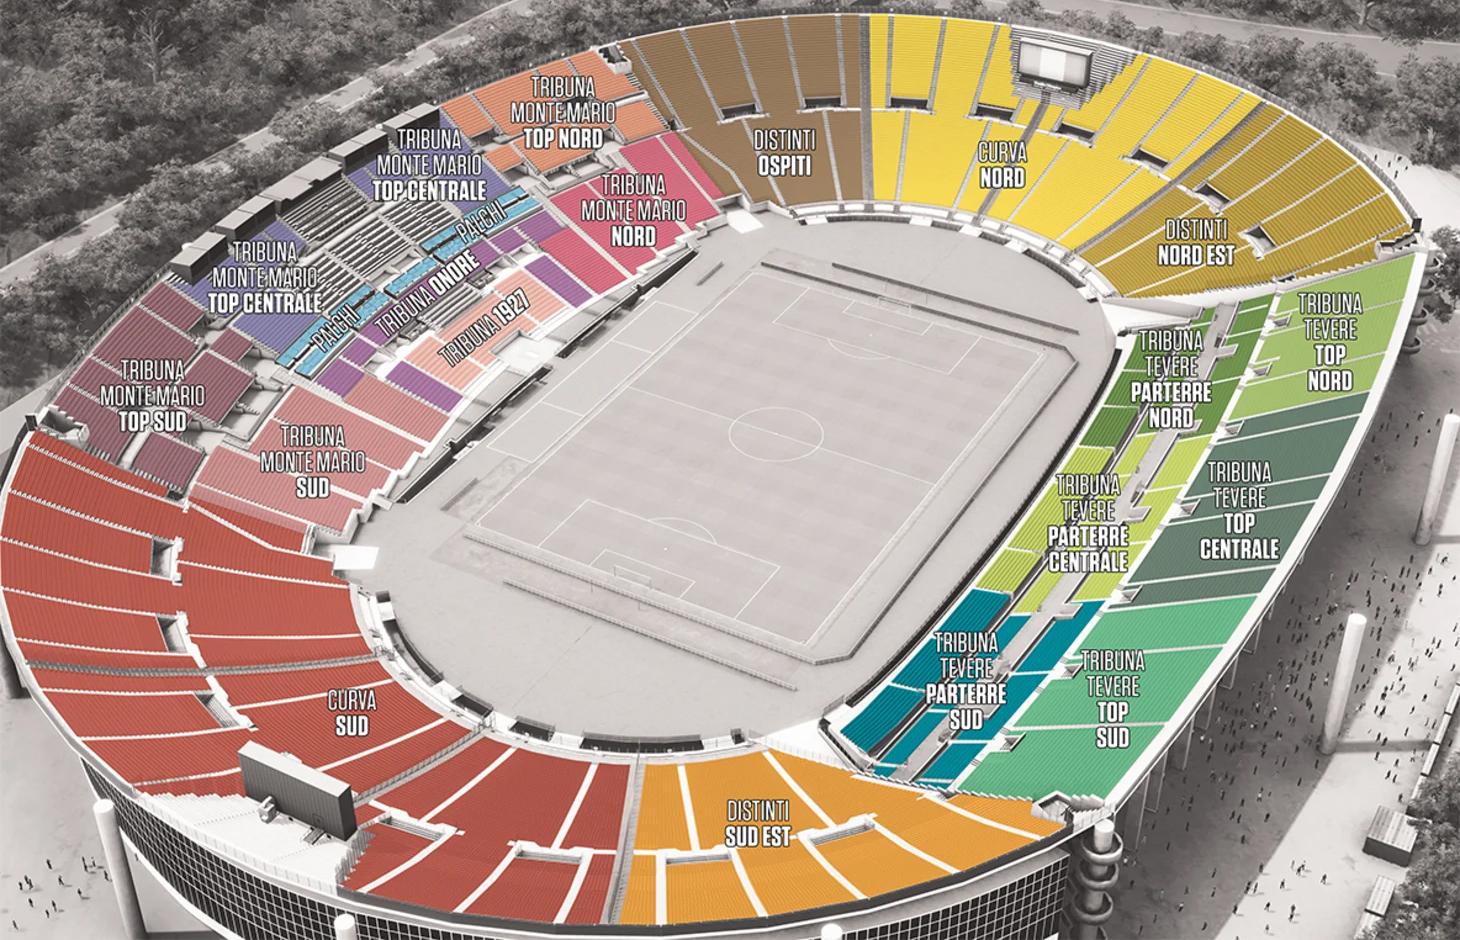 mappa stadio olimpico